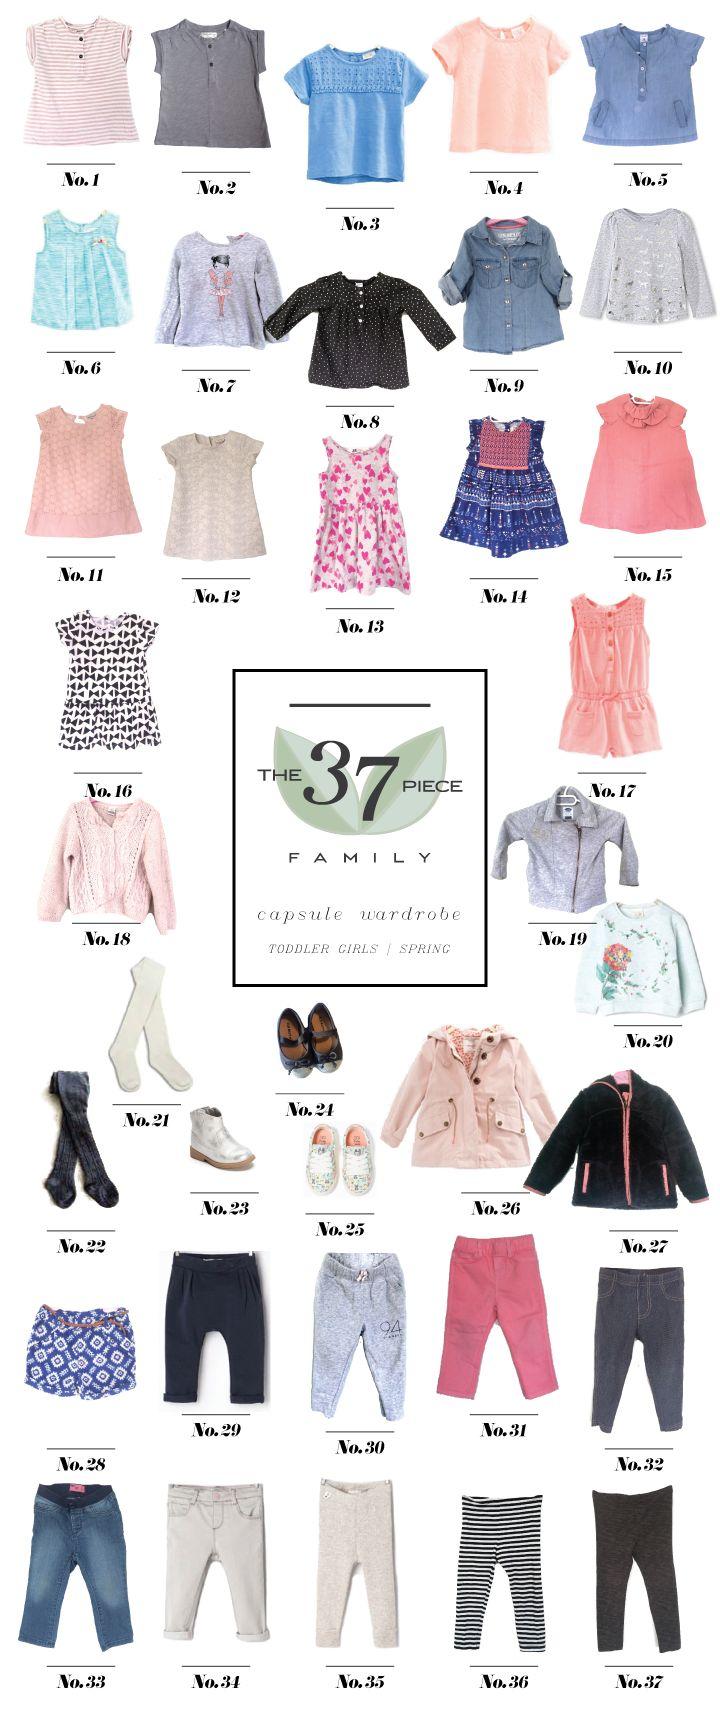 9b9c7e8106a6 Nora s Spring Capsule Wardrobe   Toddler Girls